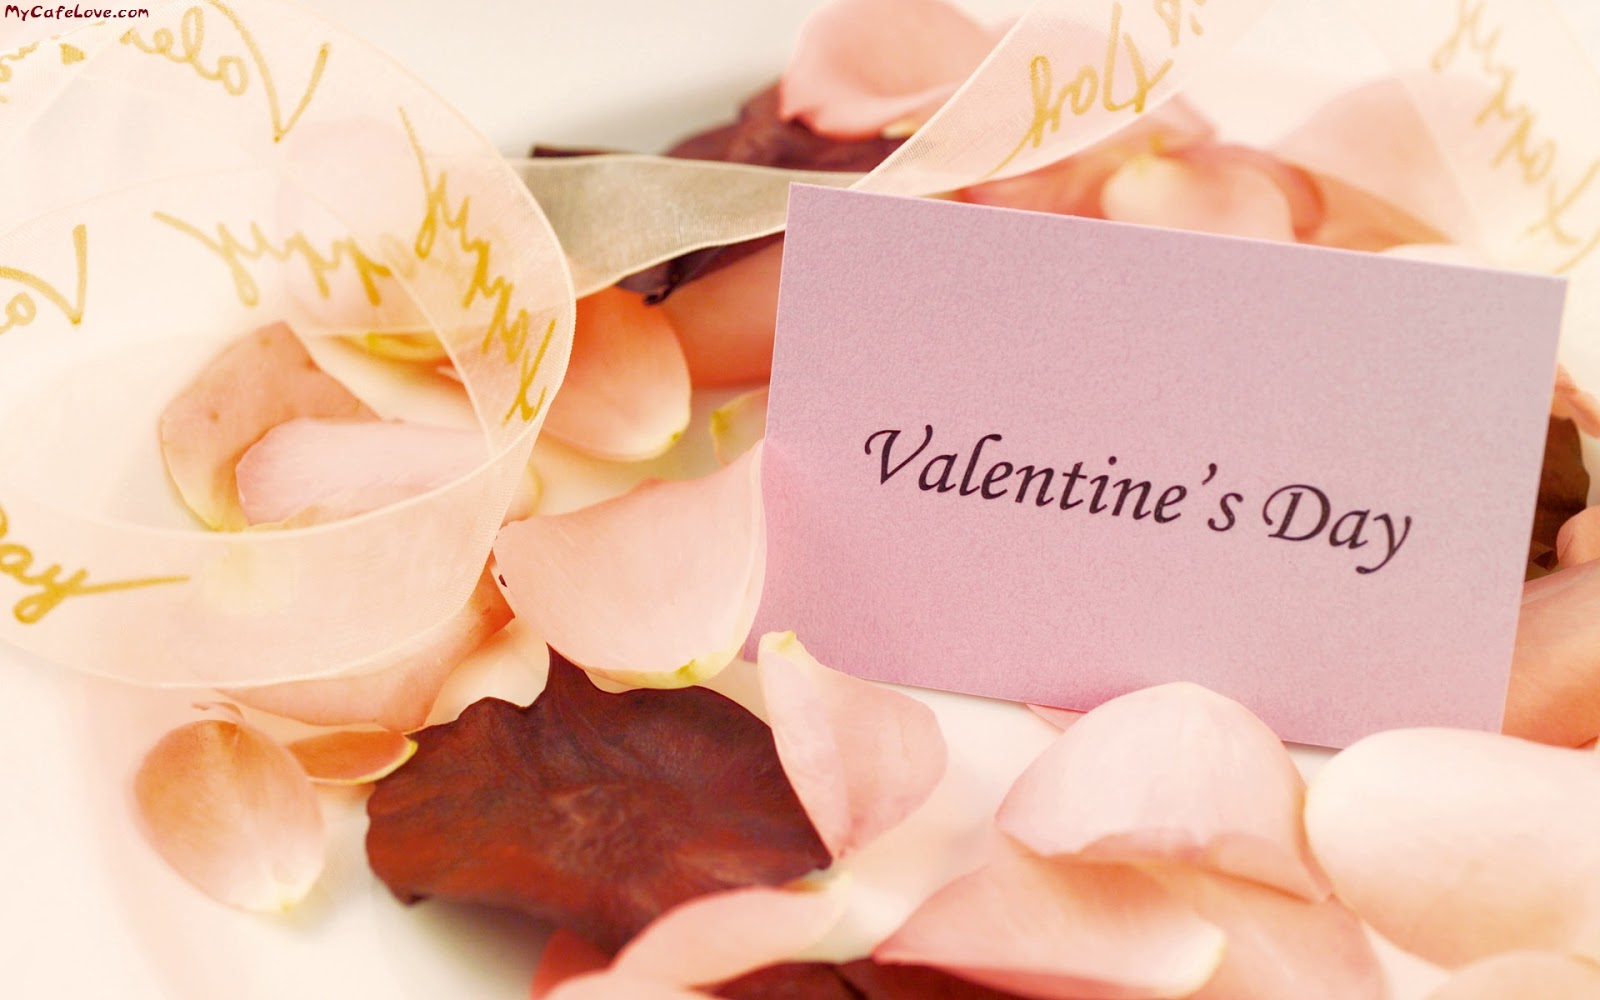 http://4.bp.blogspot.com/-MCoJtzvlqzE/URE1bqlmcVI/AAAAAAAAGYM/rWW8cGFaG1Q/s1600/valentines+day+chit.jpg